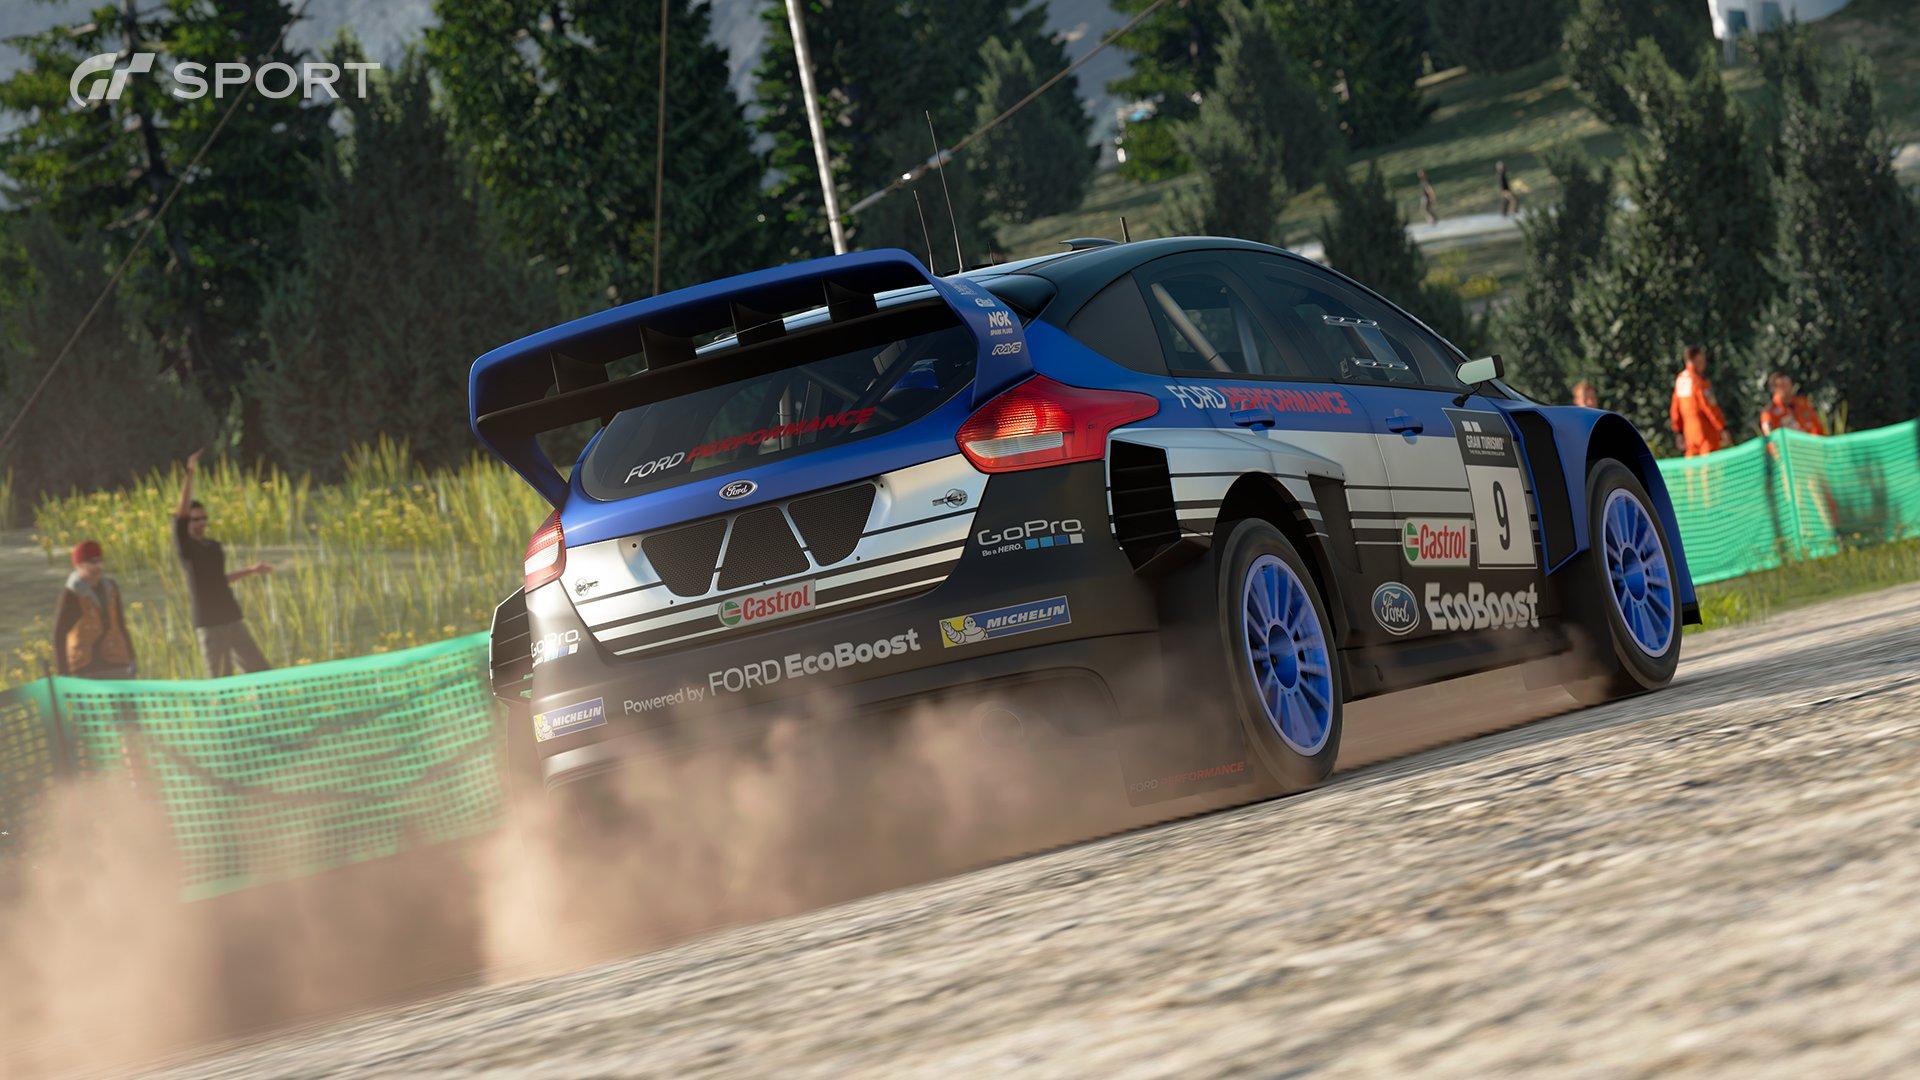 Gran Turismo Sport Ford Focus Gr B rally car race 2